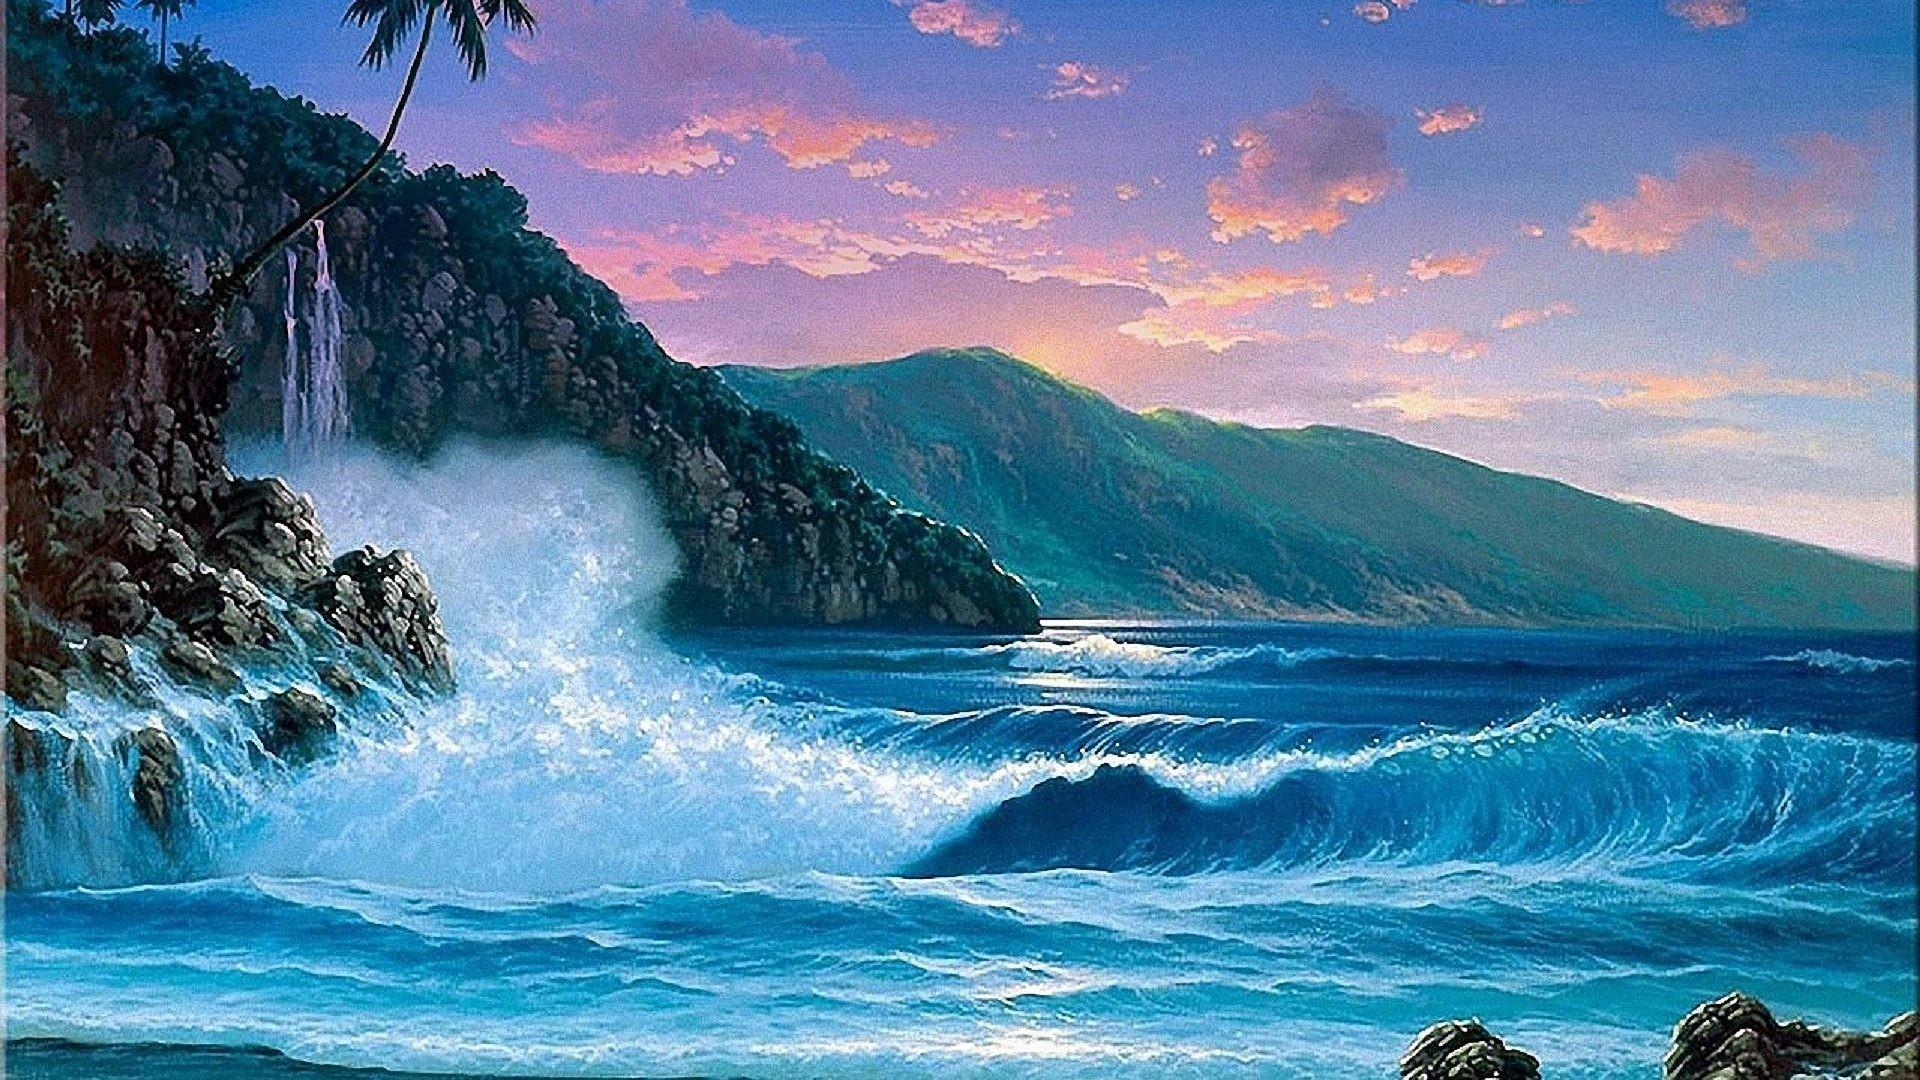 ocean wallpapers high resolution